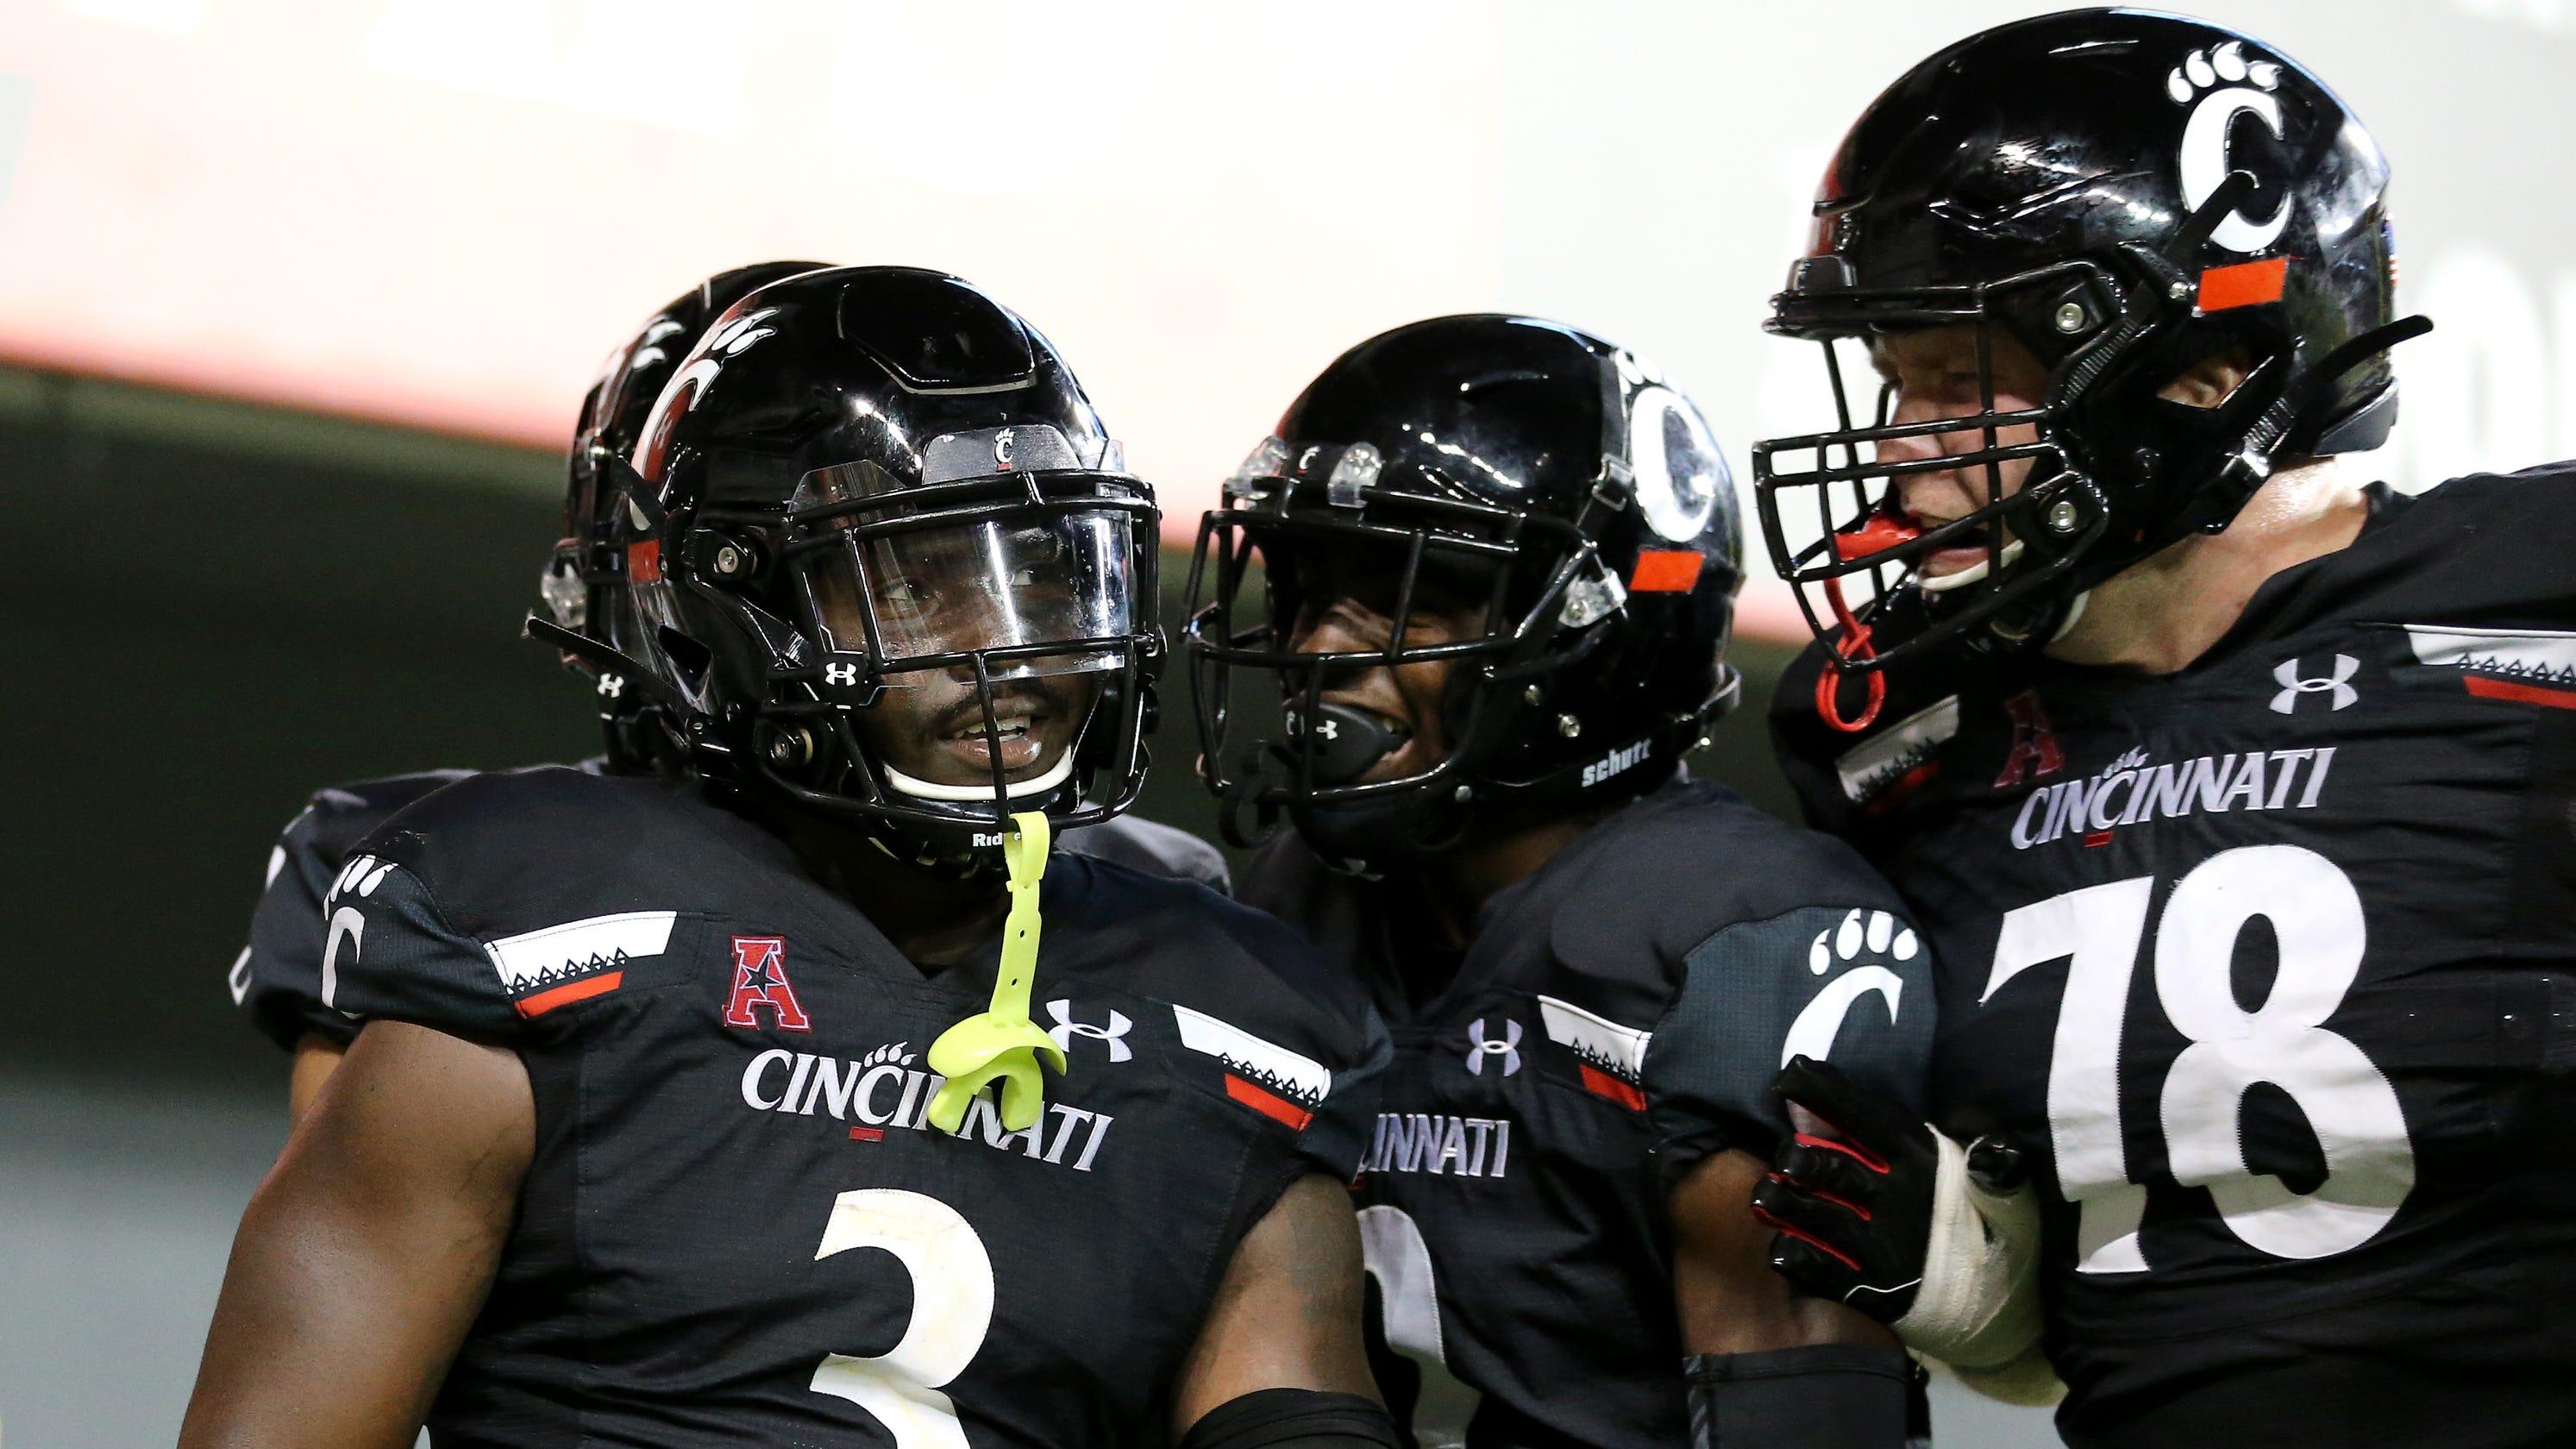 Ucf Vs Cincinnati Free Ncaa Football Betting Picks And Game Predictions Picks